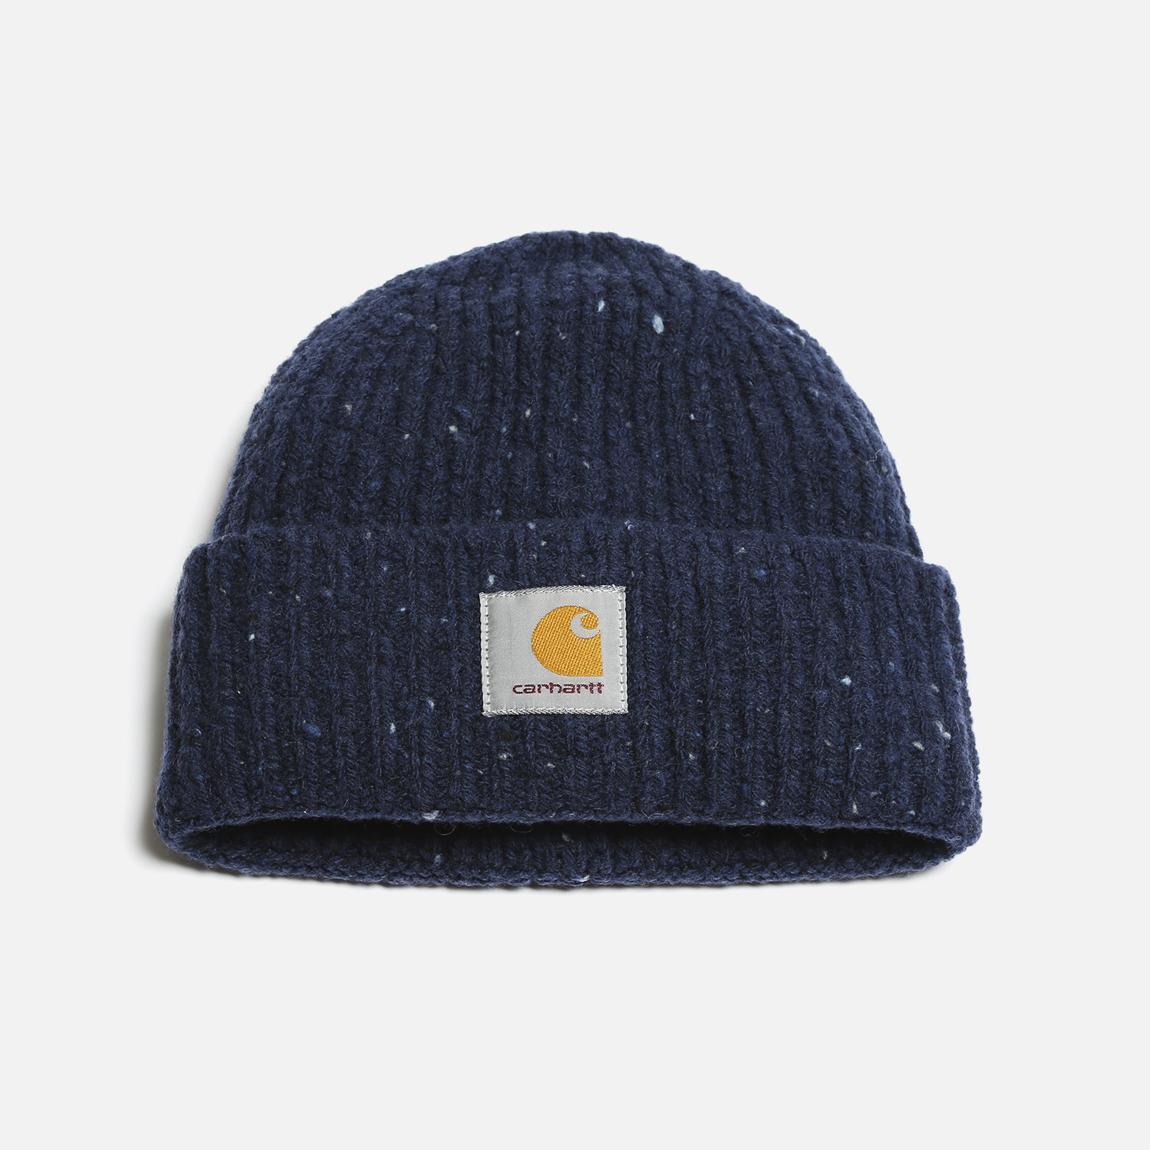 70d33633728 Anglistic Beanie- Jupiter Heather Carhartt WIP Headwear ...